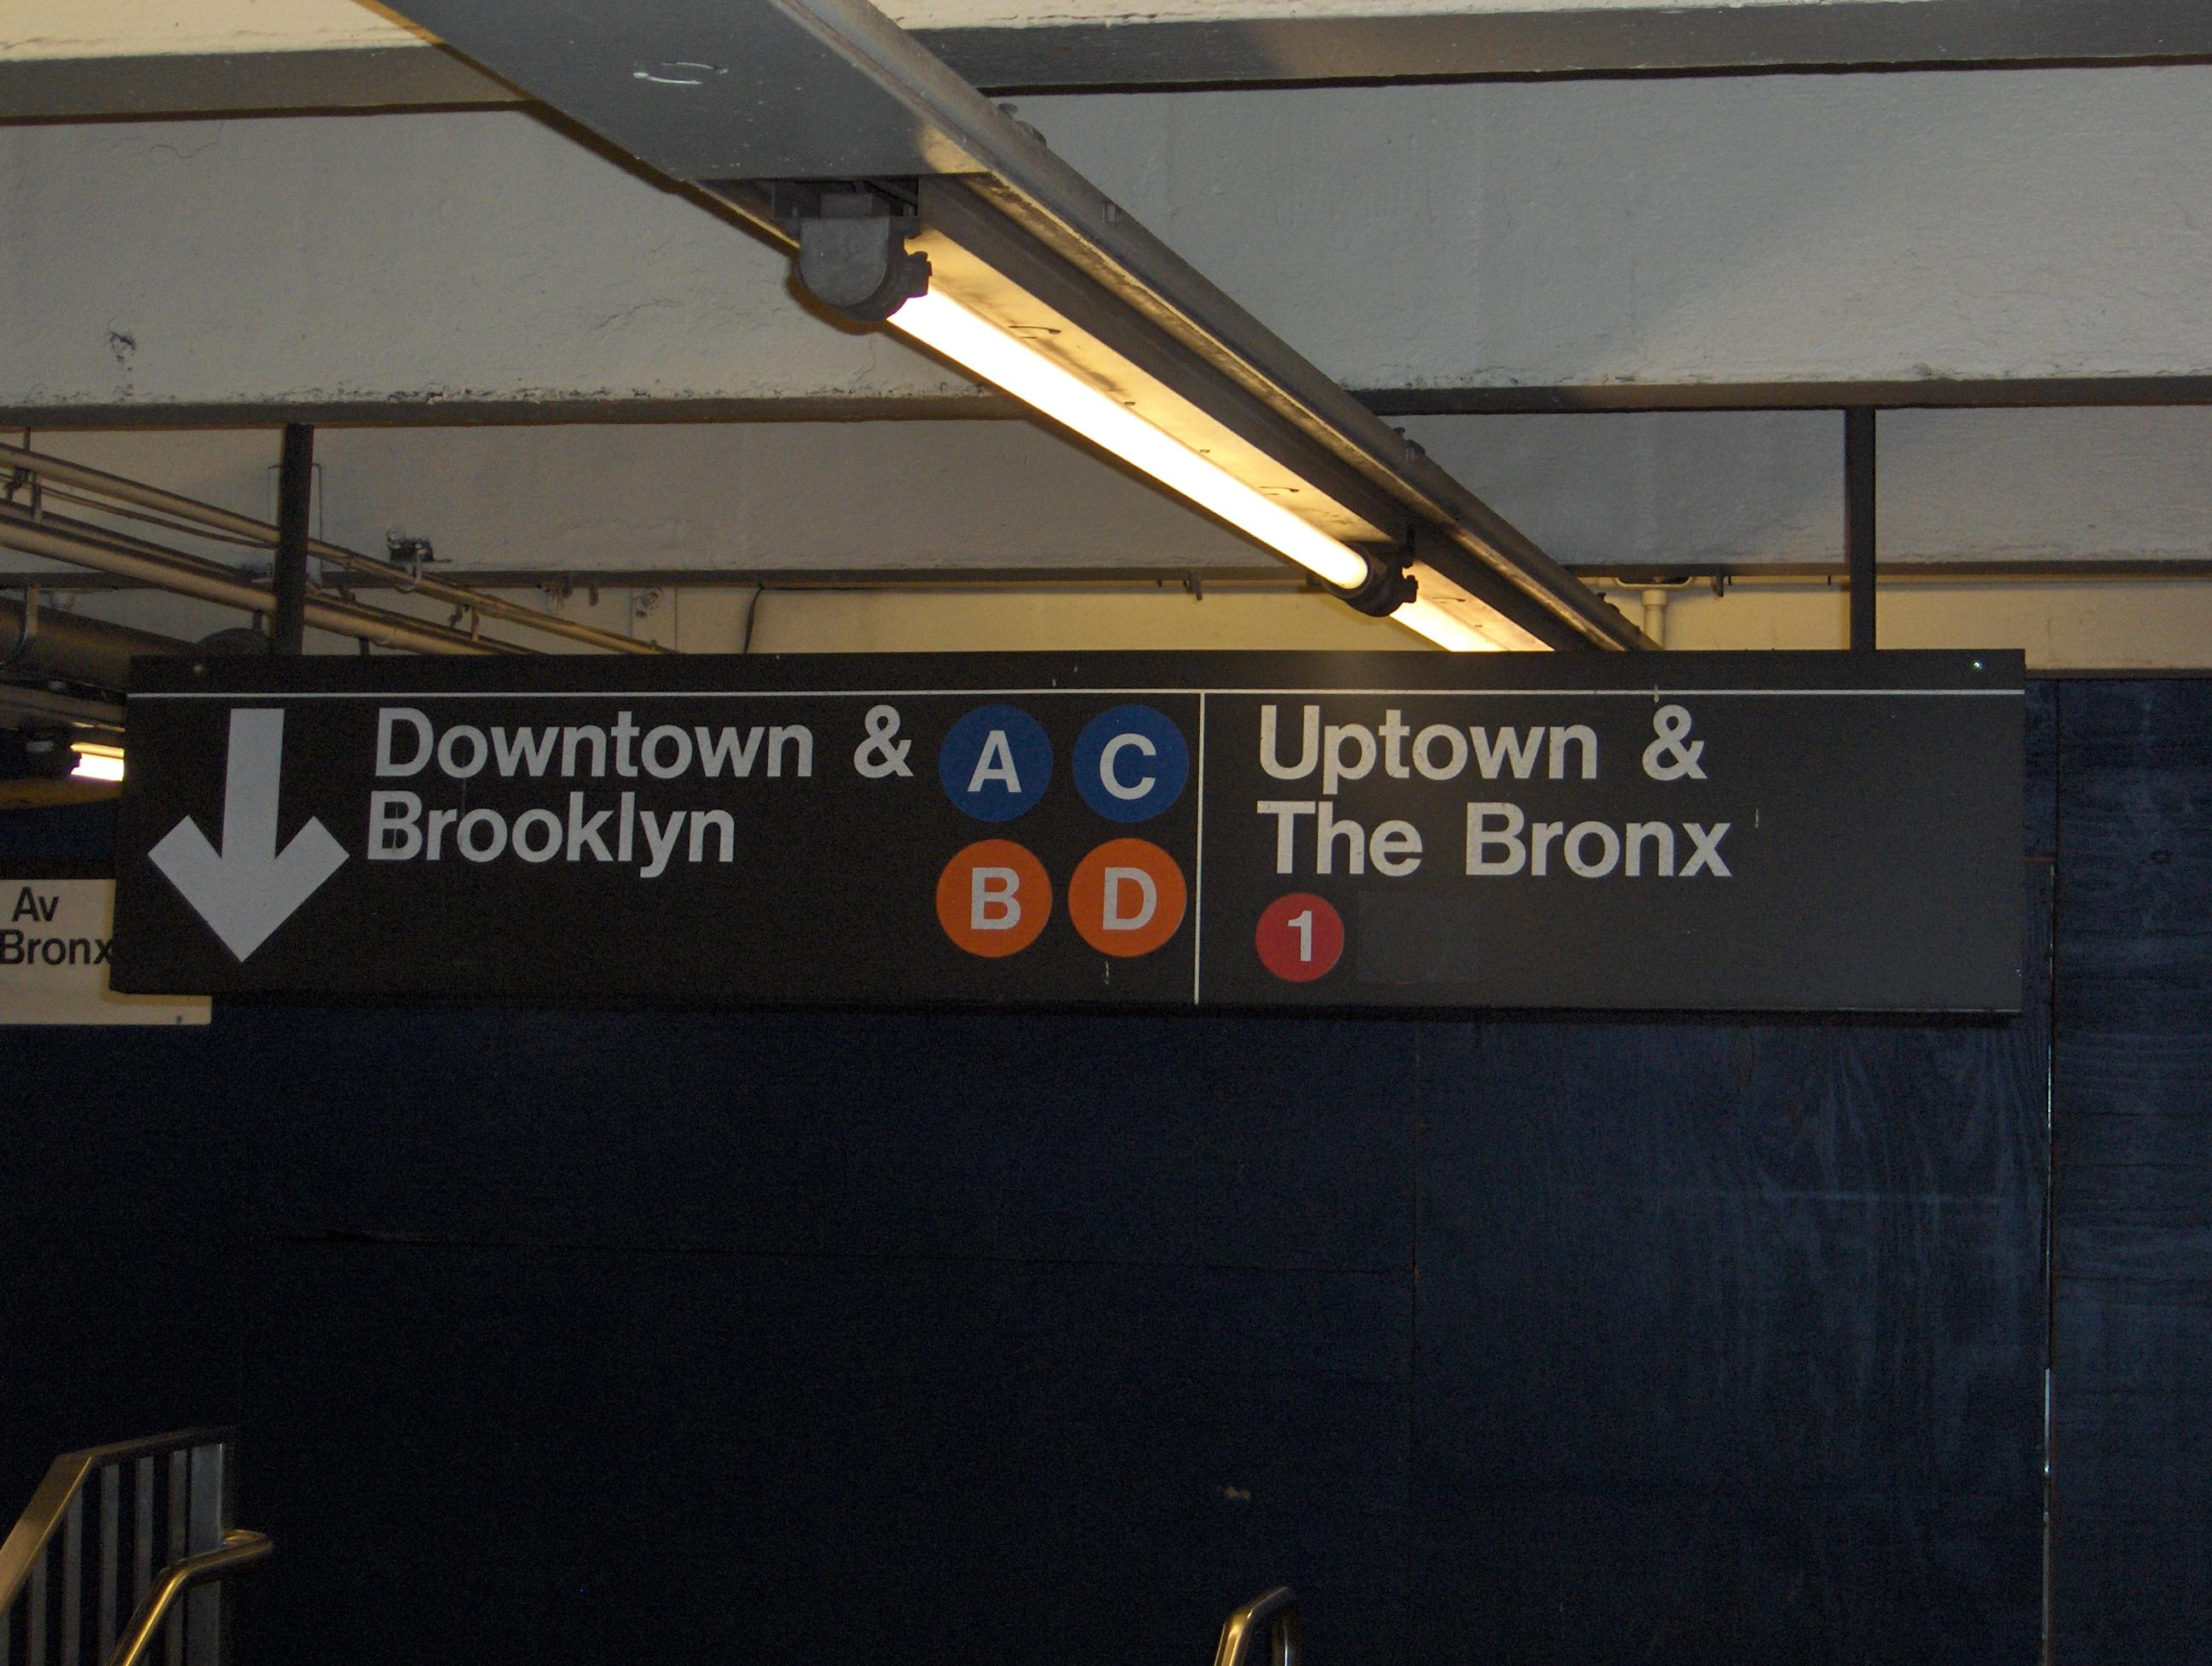 Subway Map Coloring Page.New York City Subway Nomenclature Wikipedia